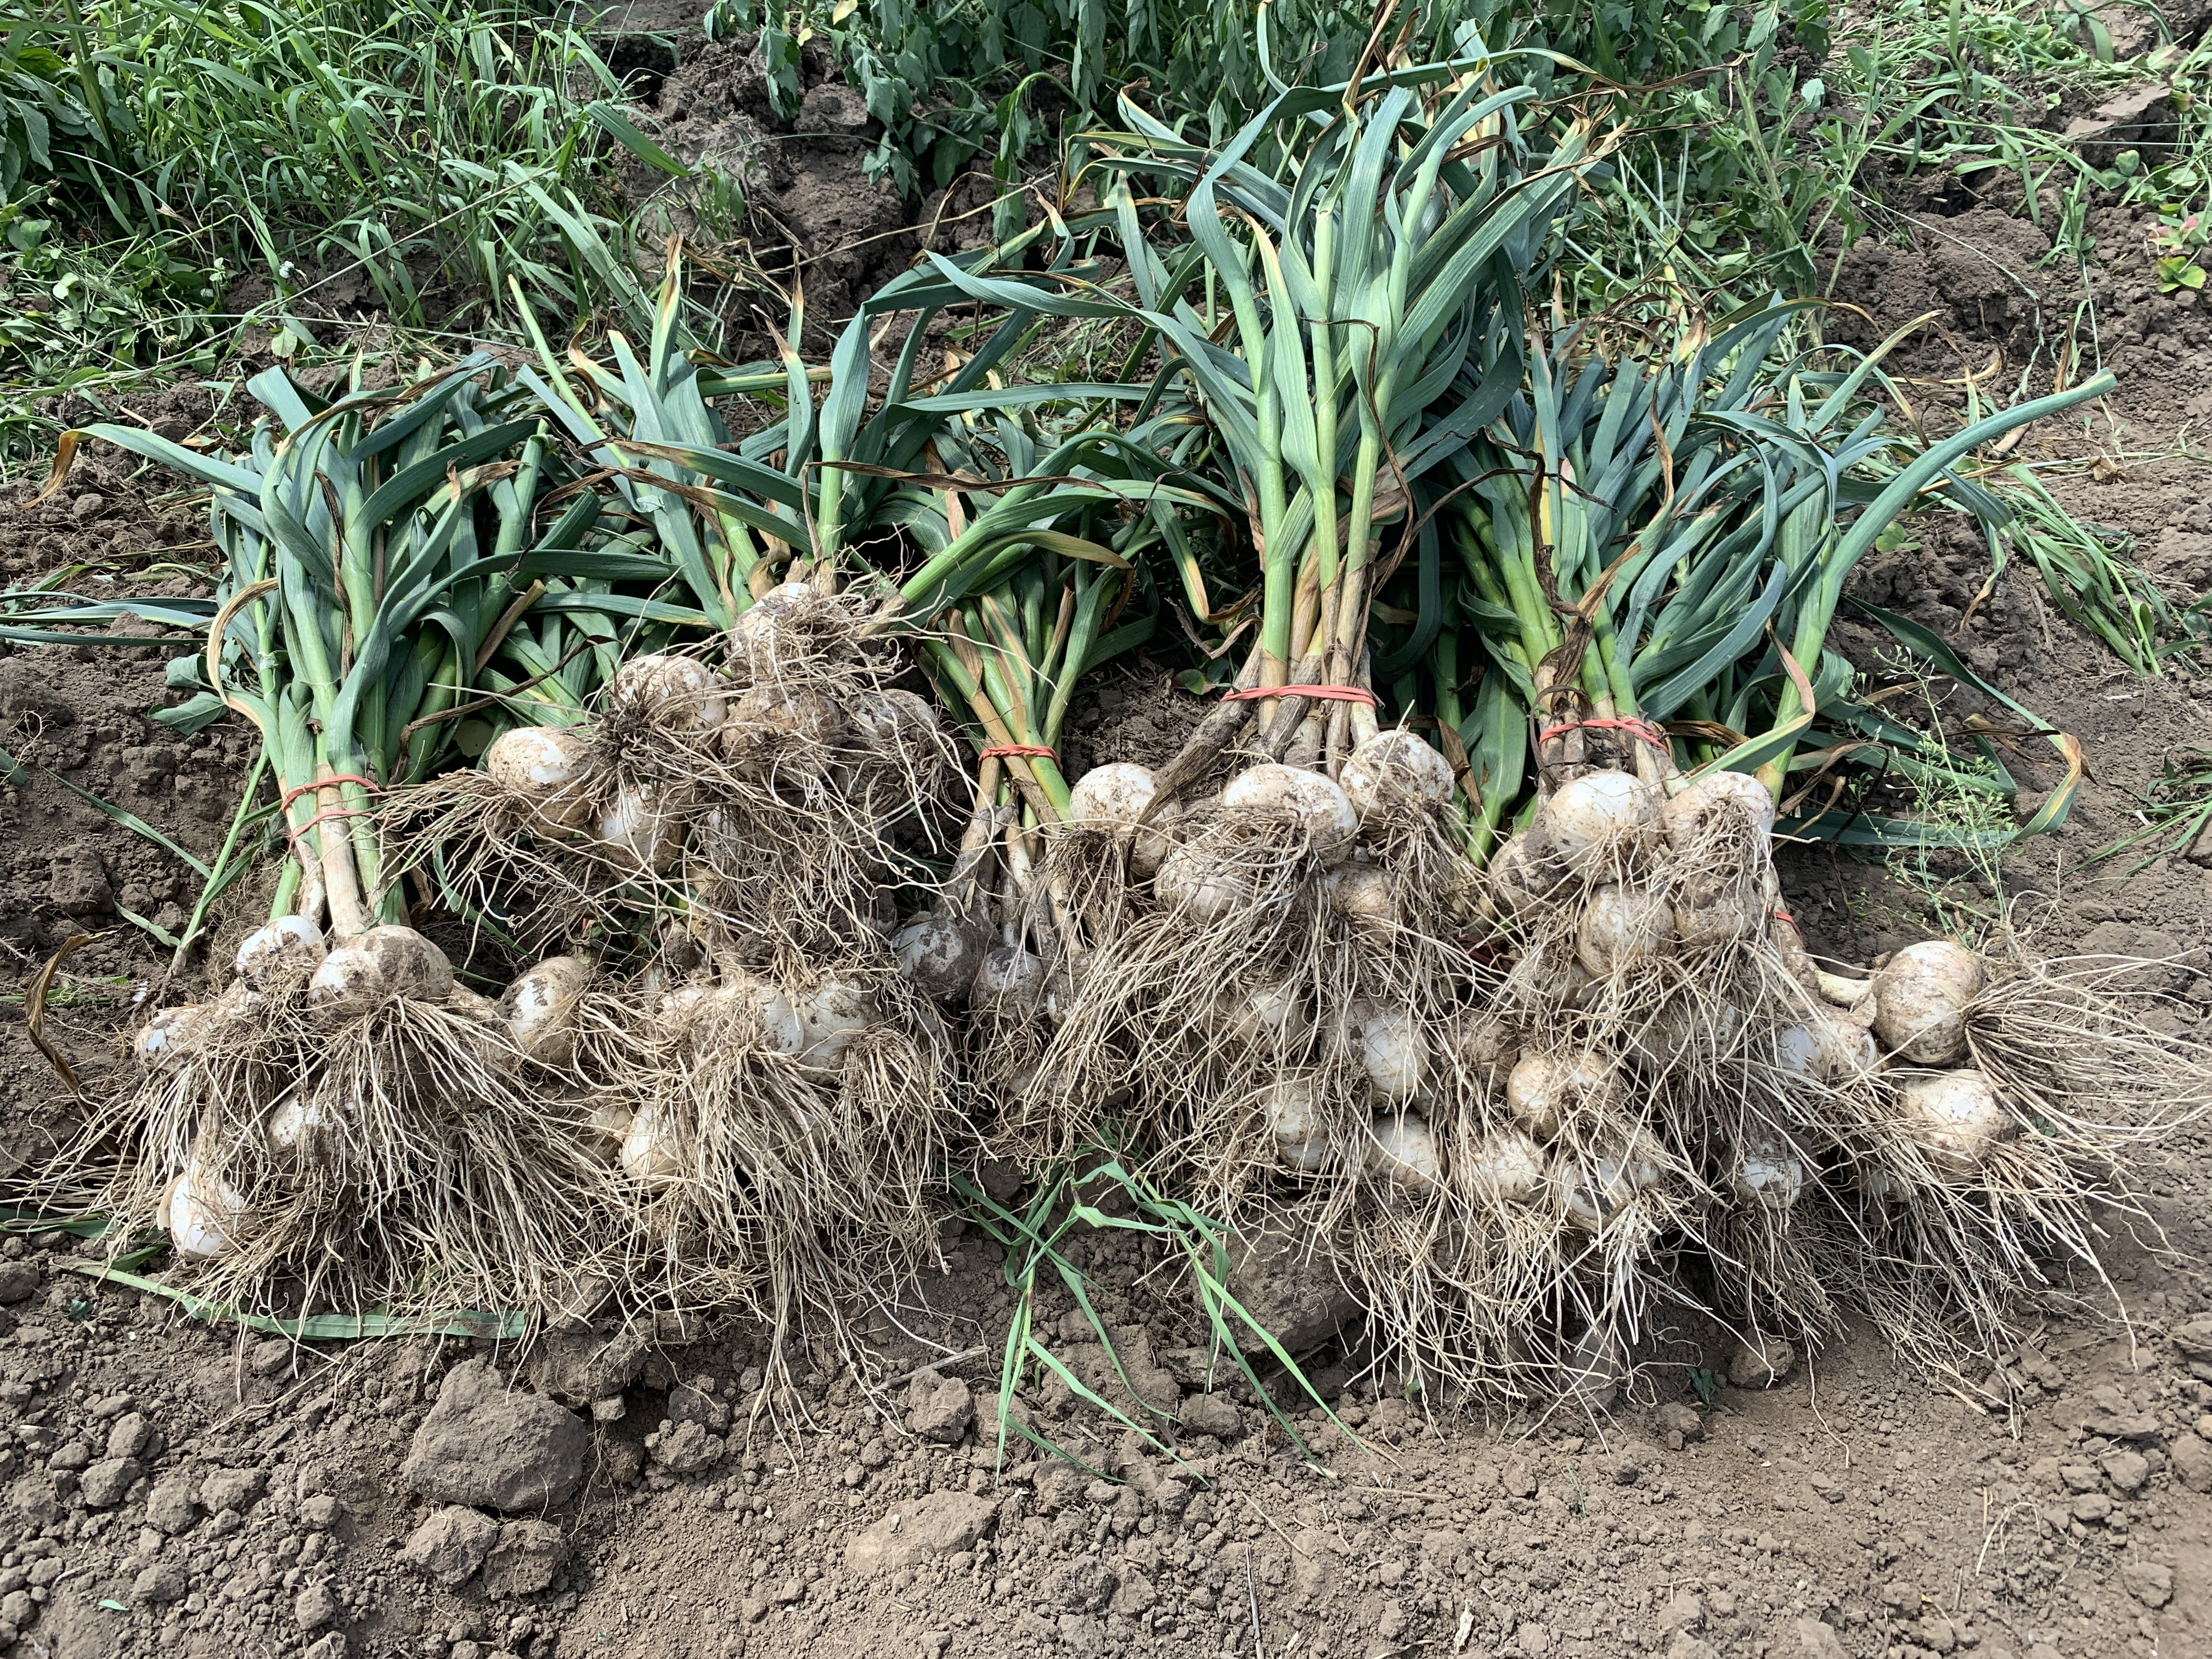 Farm Share Week 7 Newsletter